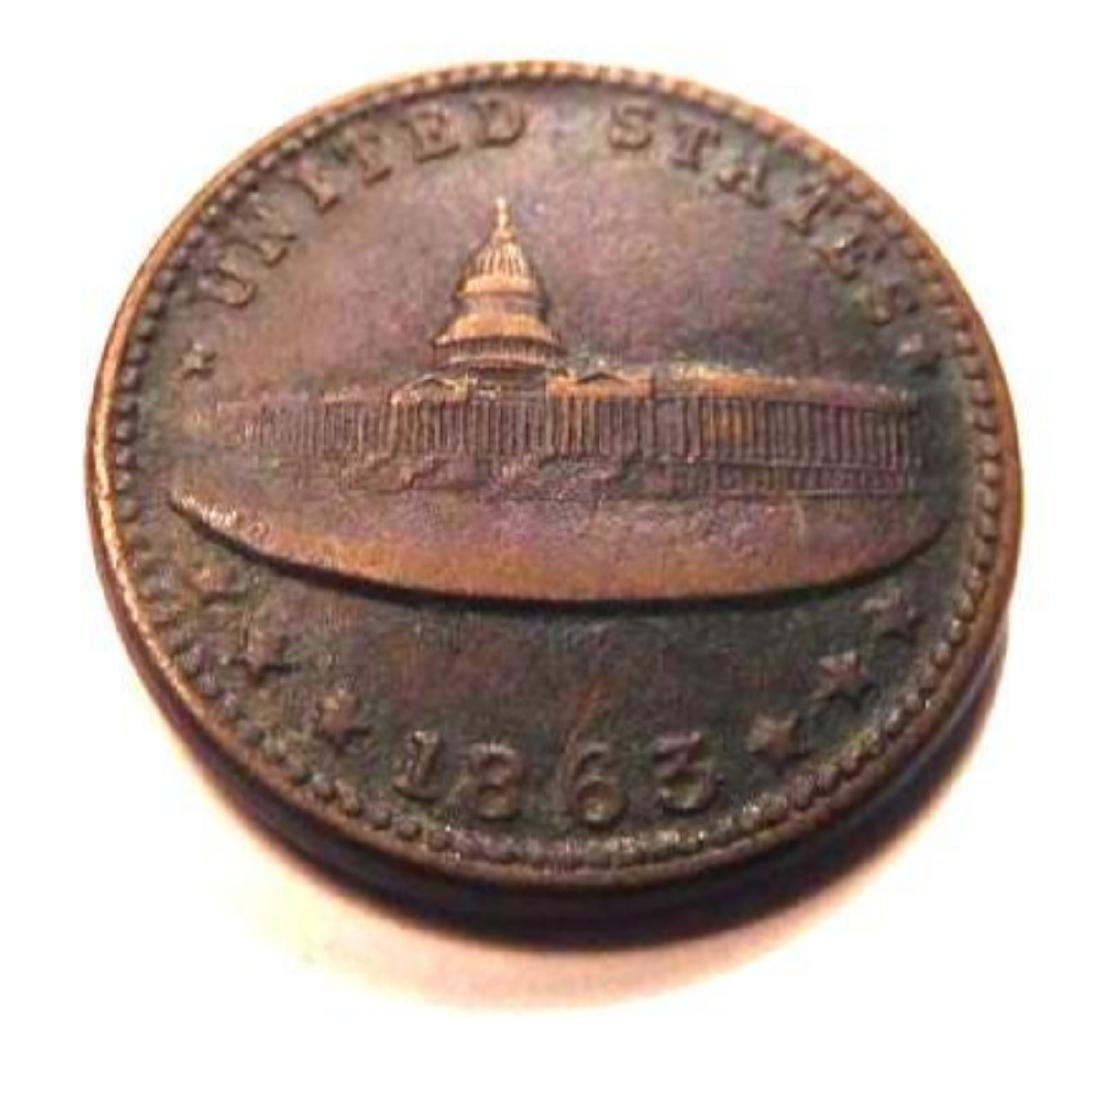 1863 Civil War Token - E. W. Atwood